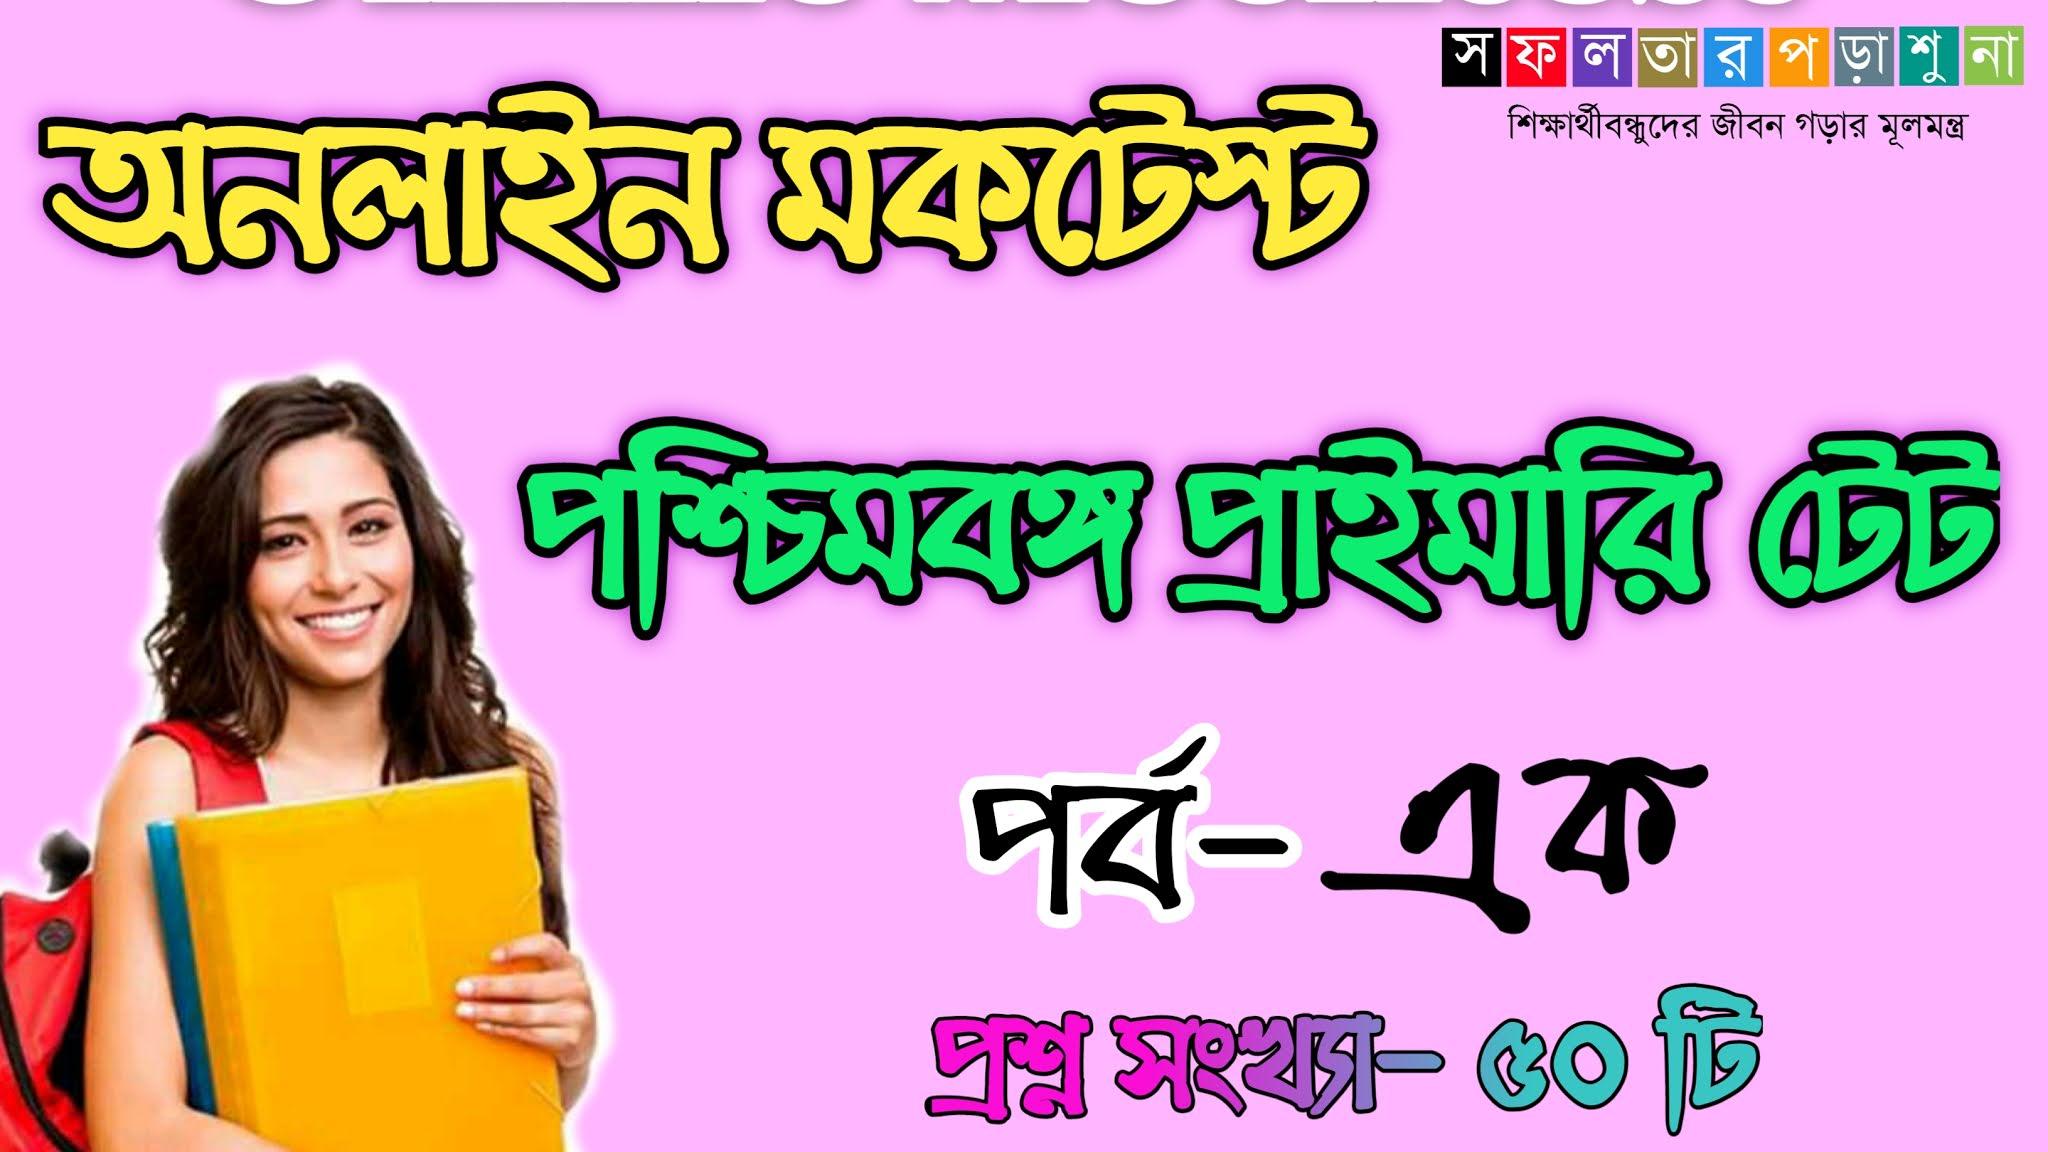 WB Primary TET Online Mocktest in Bengali (Part-1) - প্রাইমারি টেট মকটেস্ট